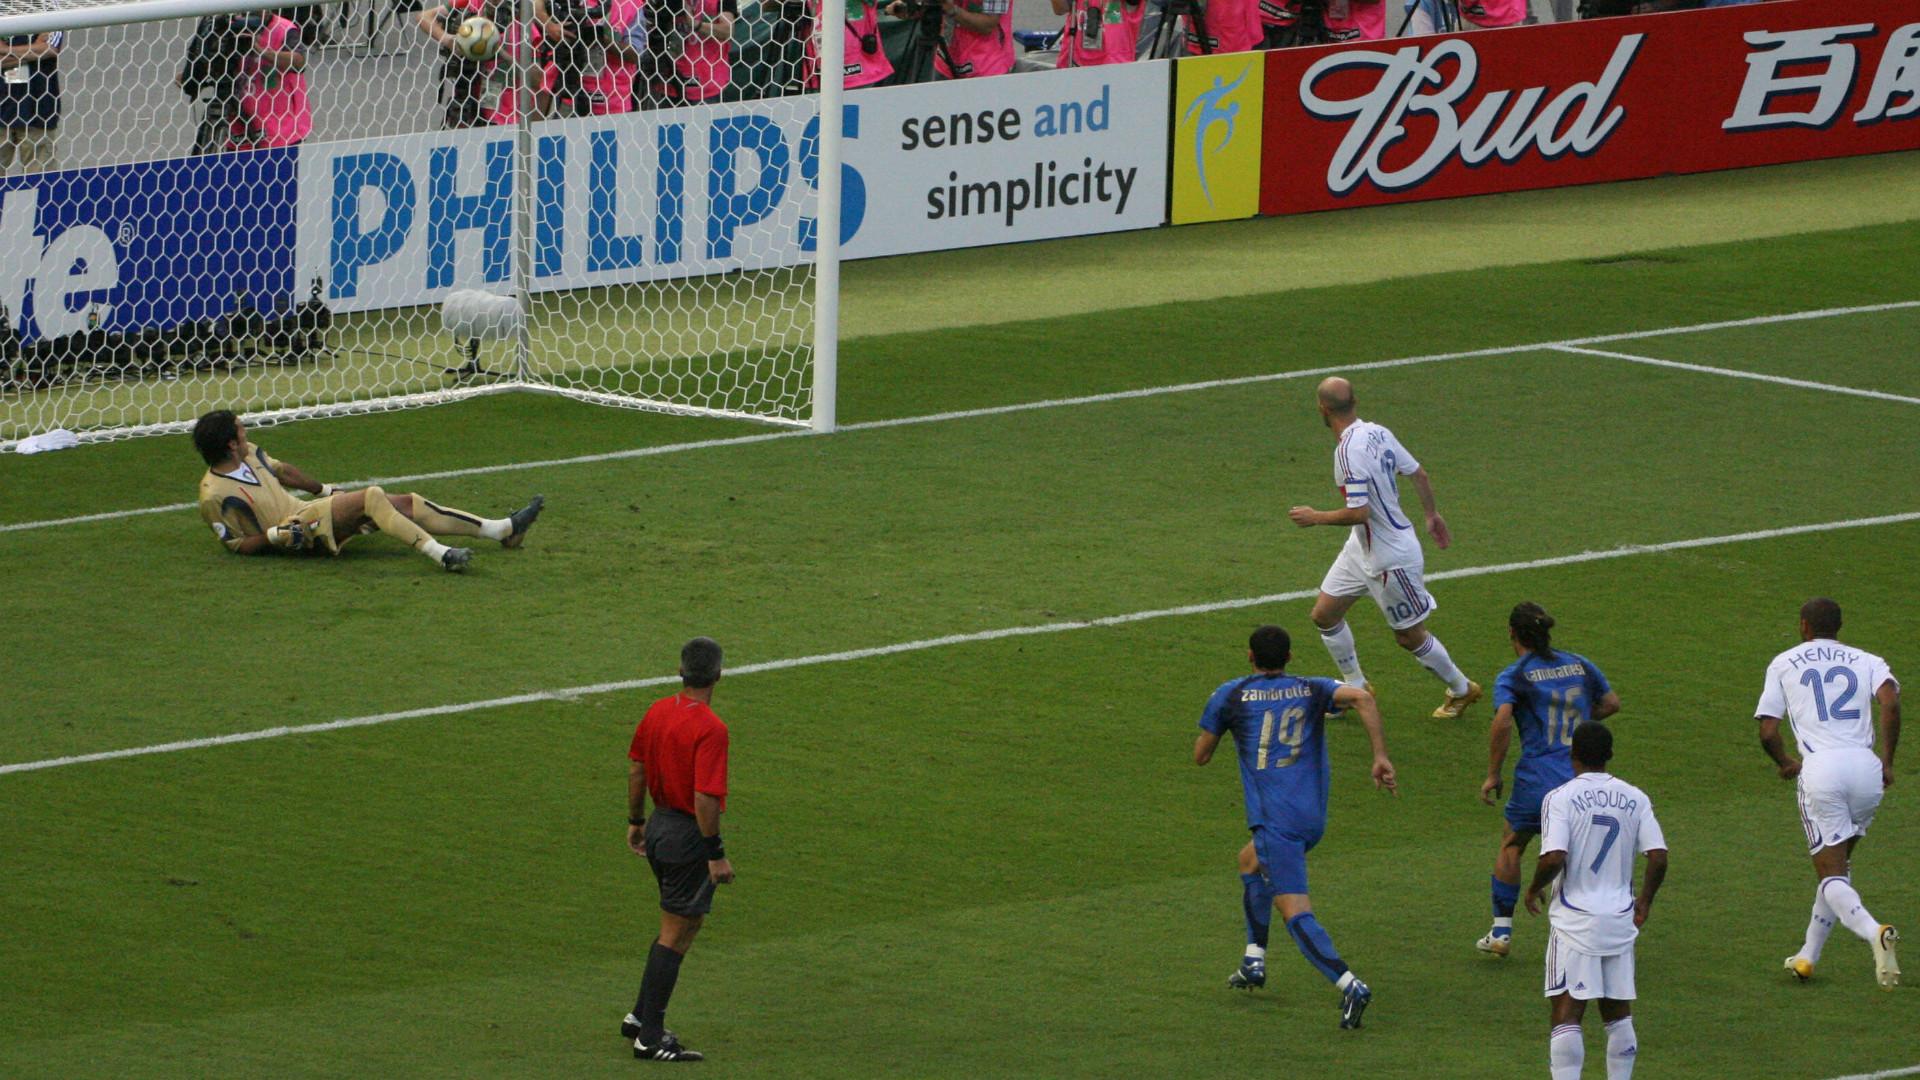 Zinedine Zidane France 2006